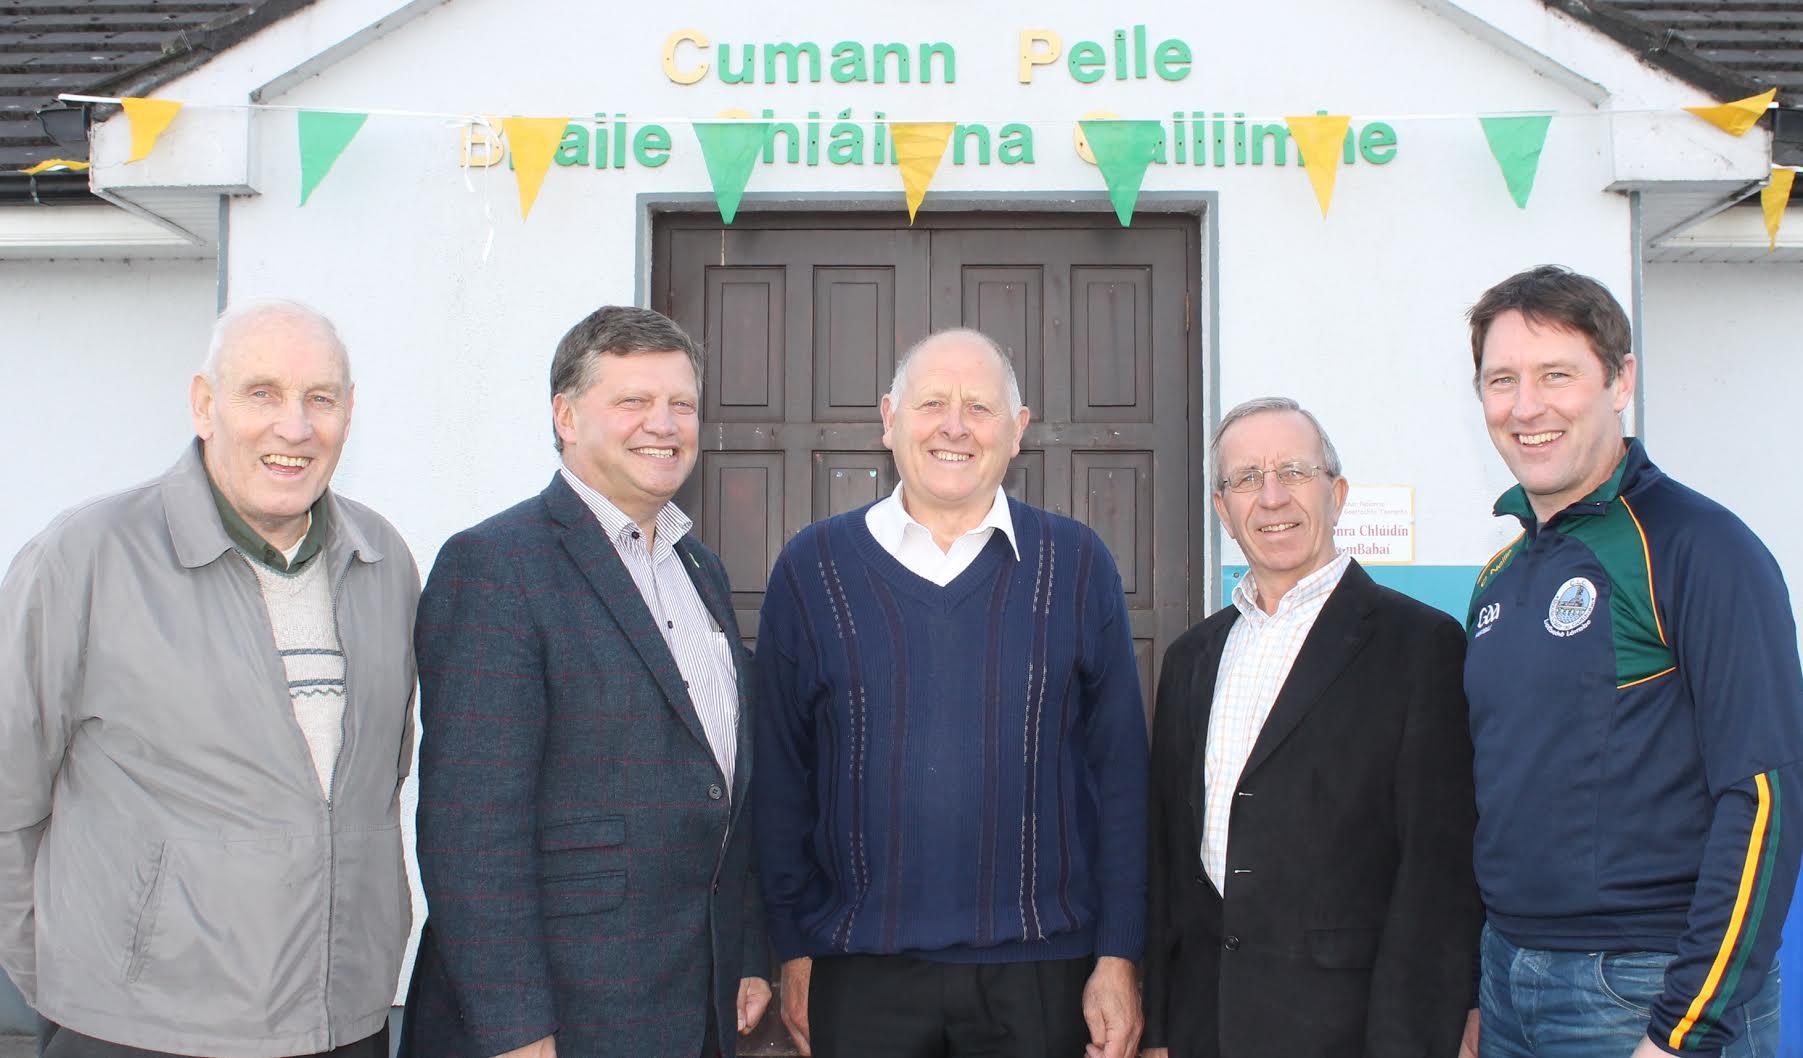 L–R: Tom Lenihan; John O'Mahony TD; Seamus O'Connell, Treasurer; Fergus Madden, Chairman; Joe O'Connell, Secretary.